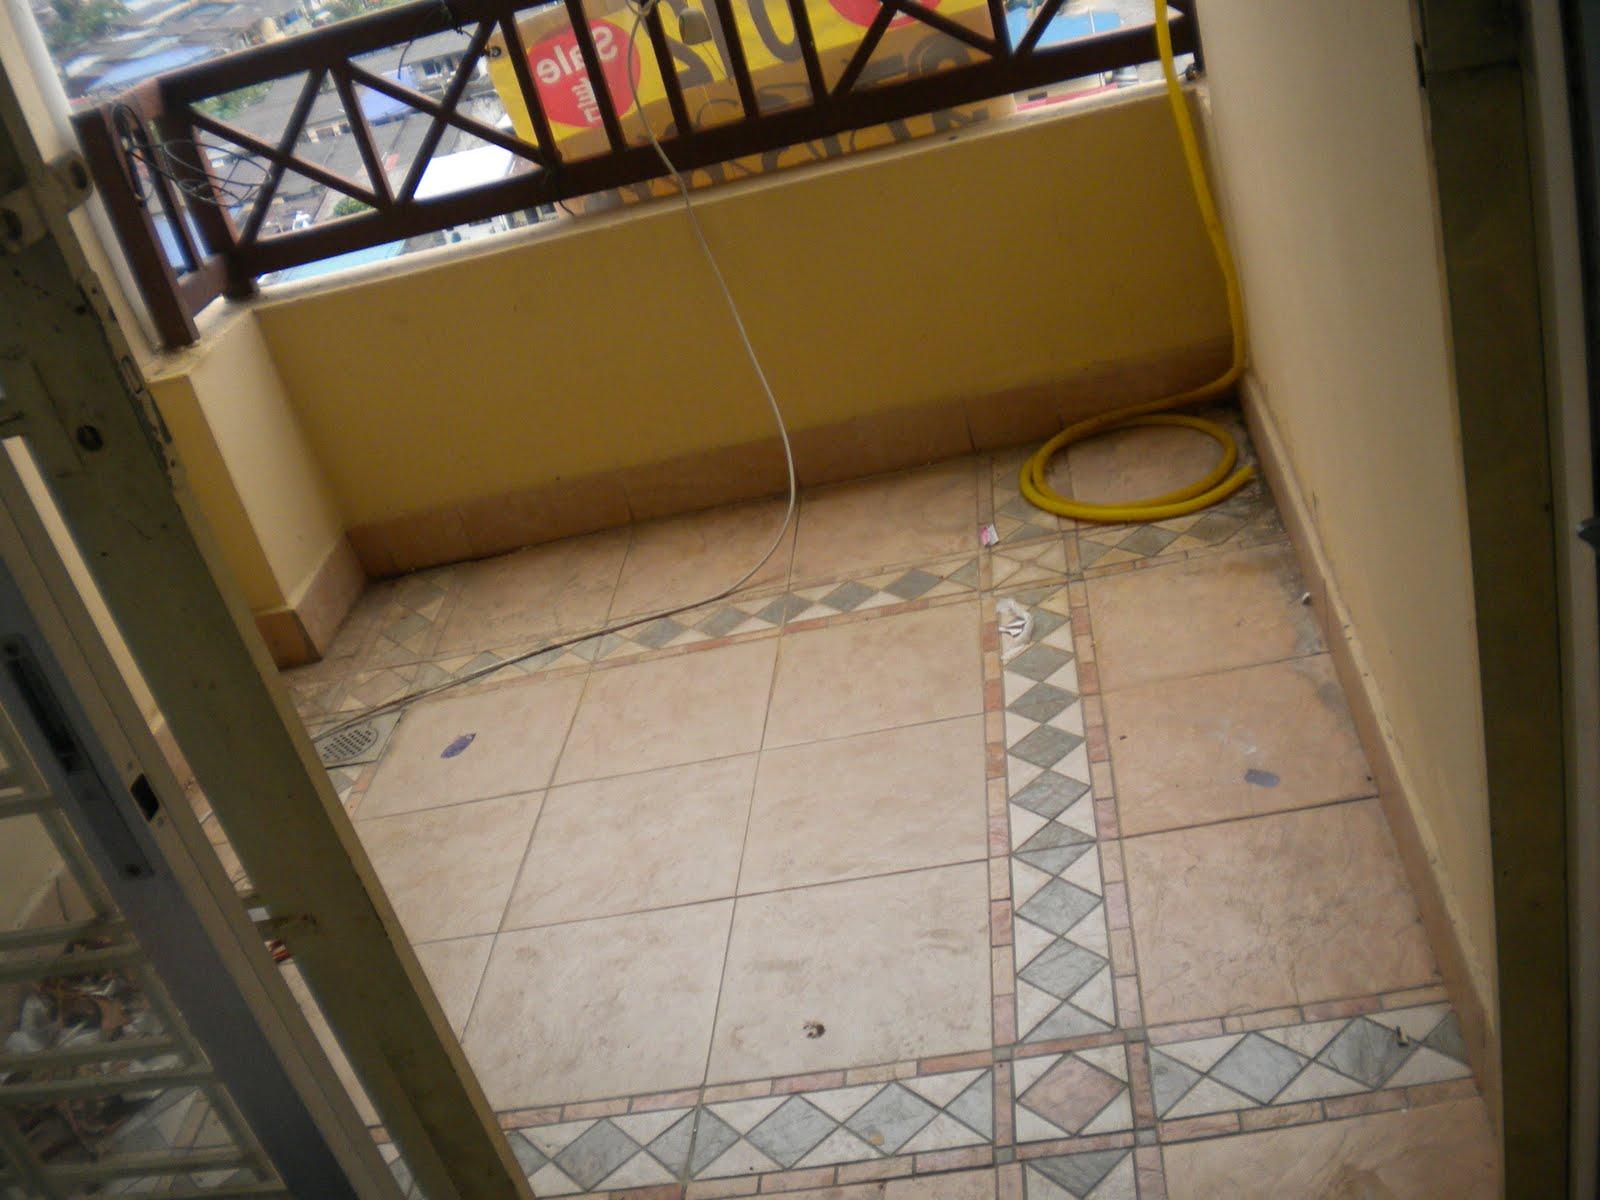 Ruang Balkoni Yang Luas 6x6 Kaki Gi Telah Dipasangkan Jubin Lantai Asal Adalah